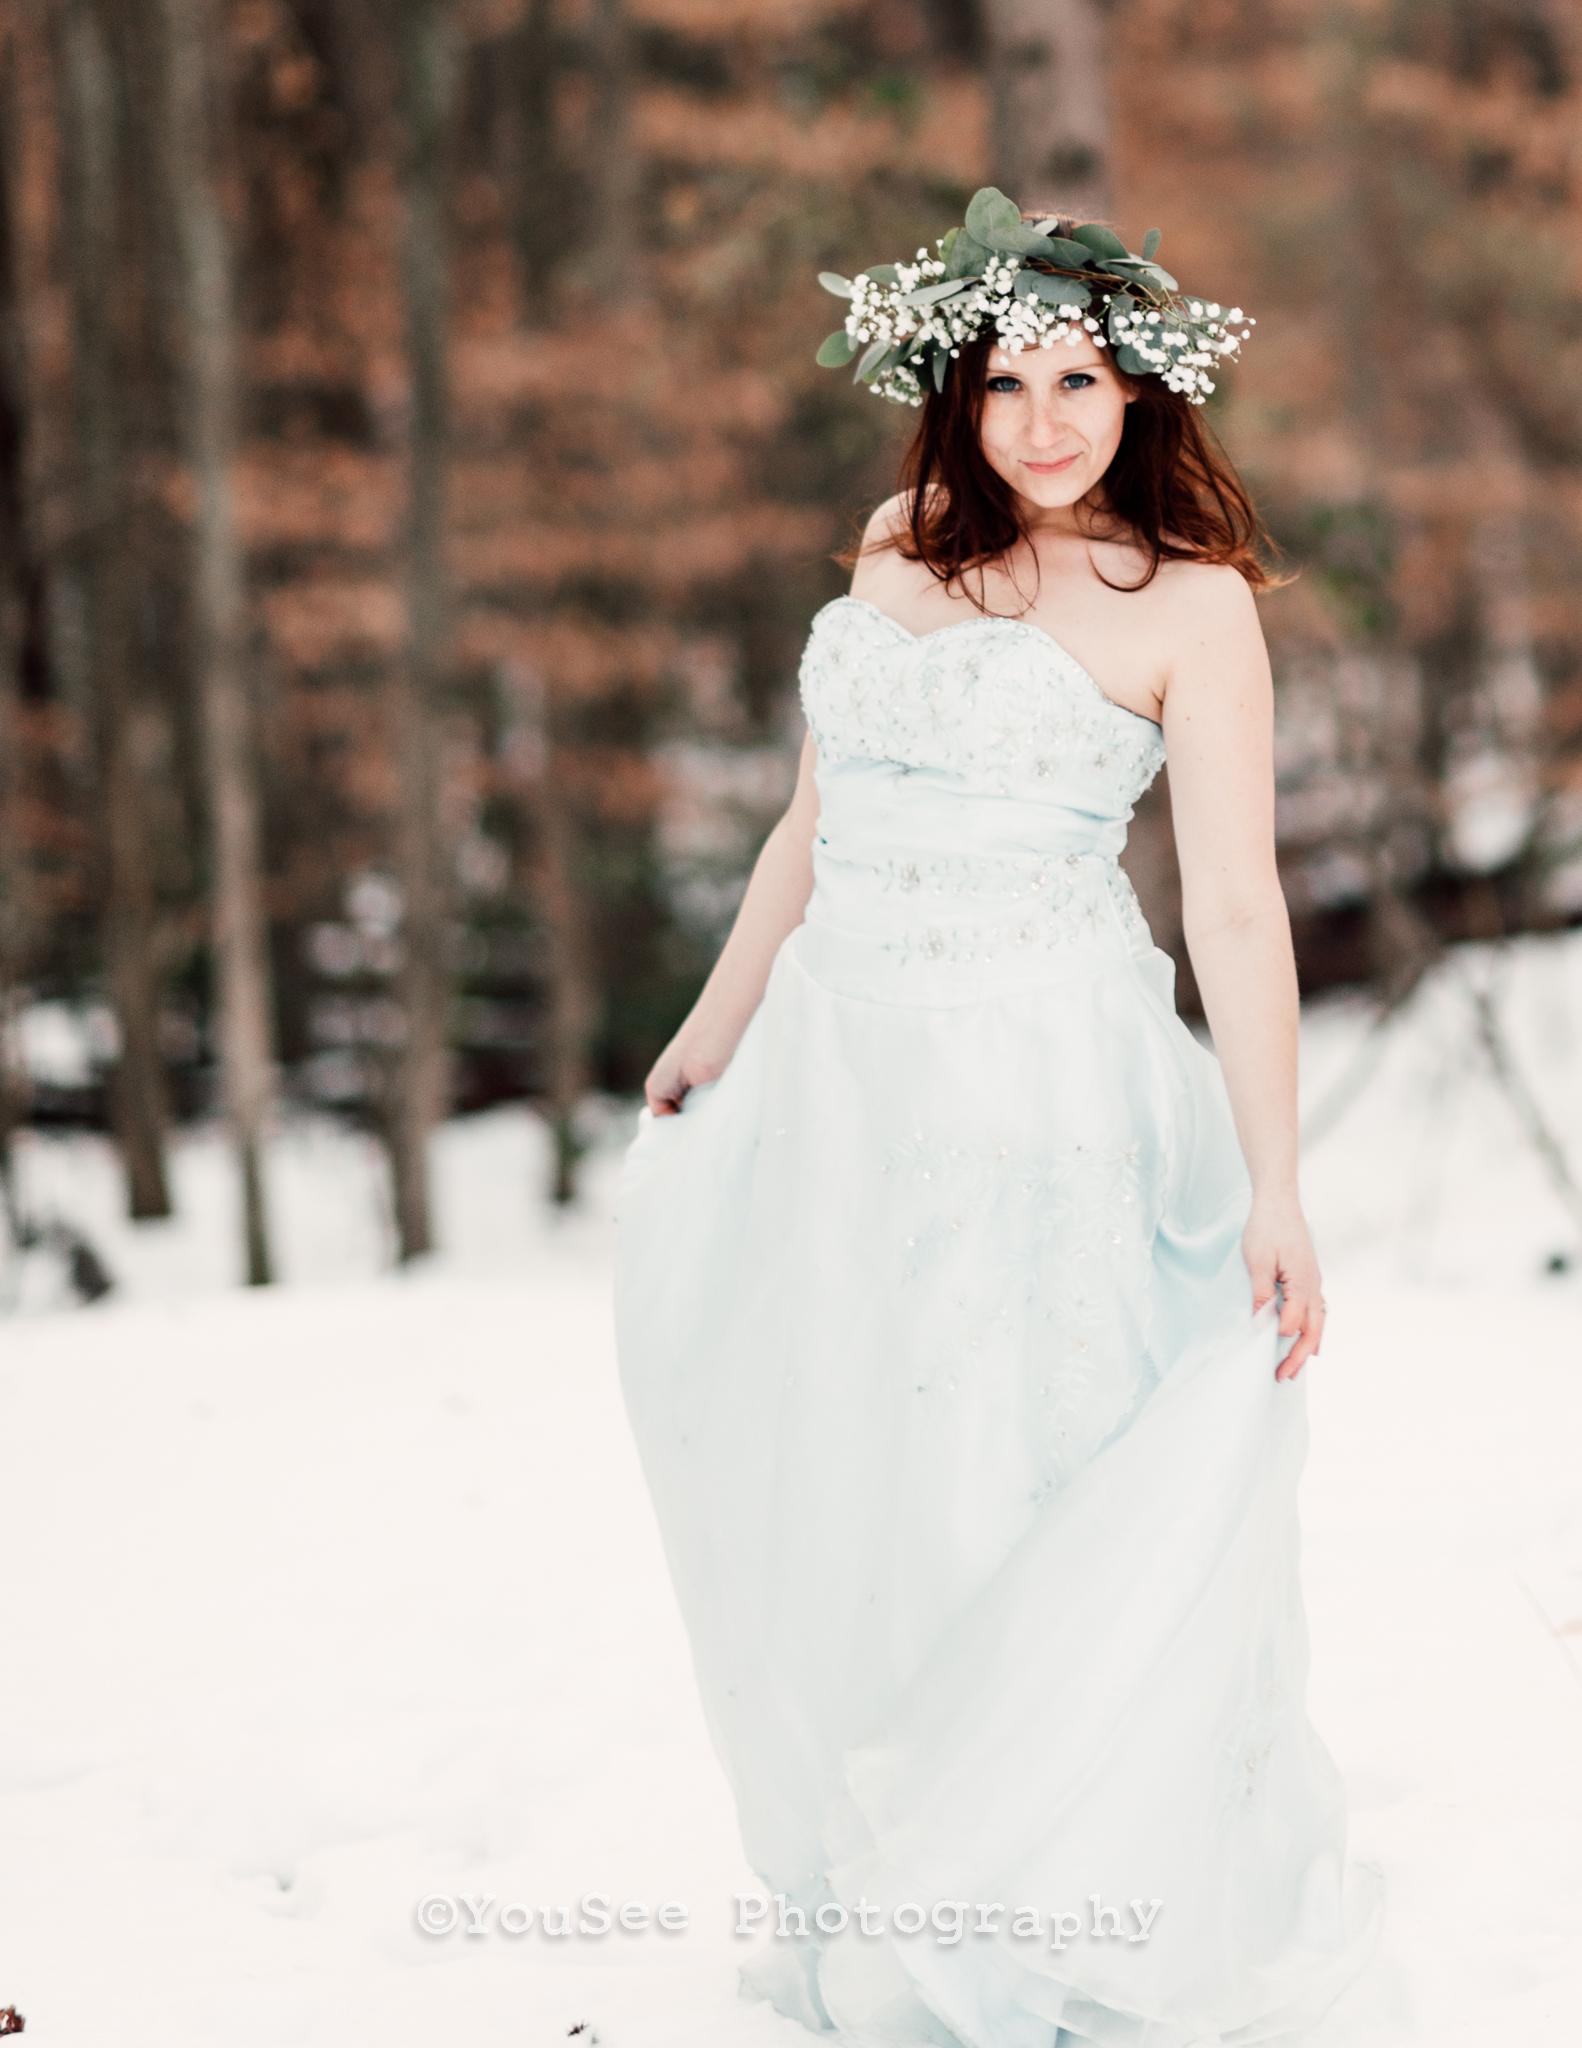 seniorportrait_fredericksburg_photography_winter2 (30)